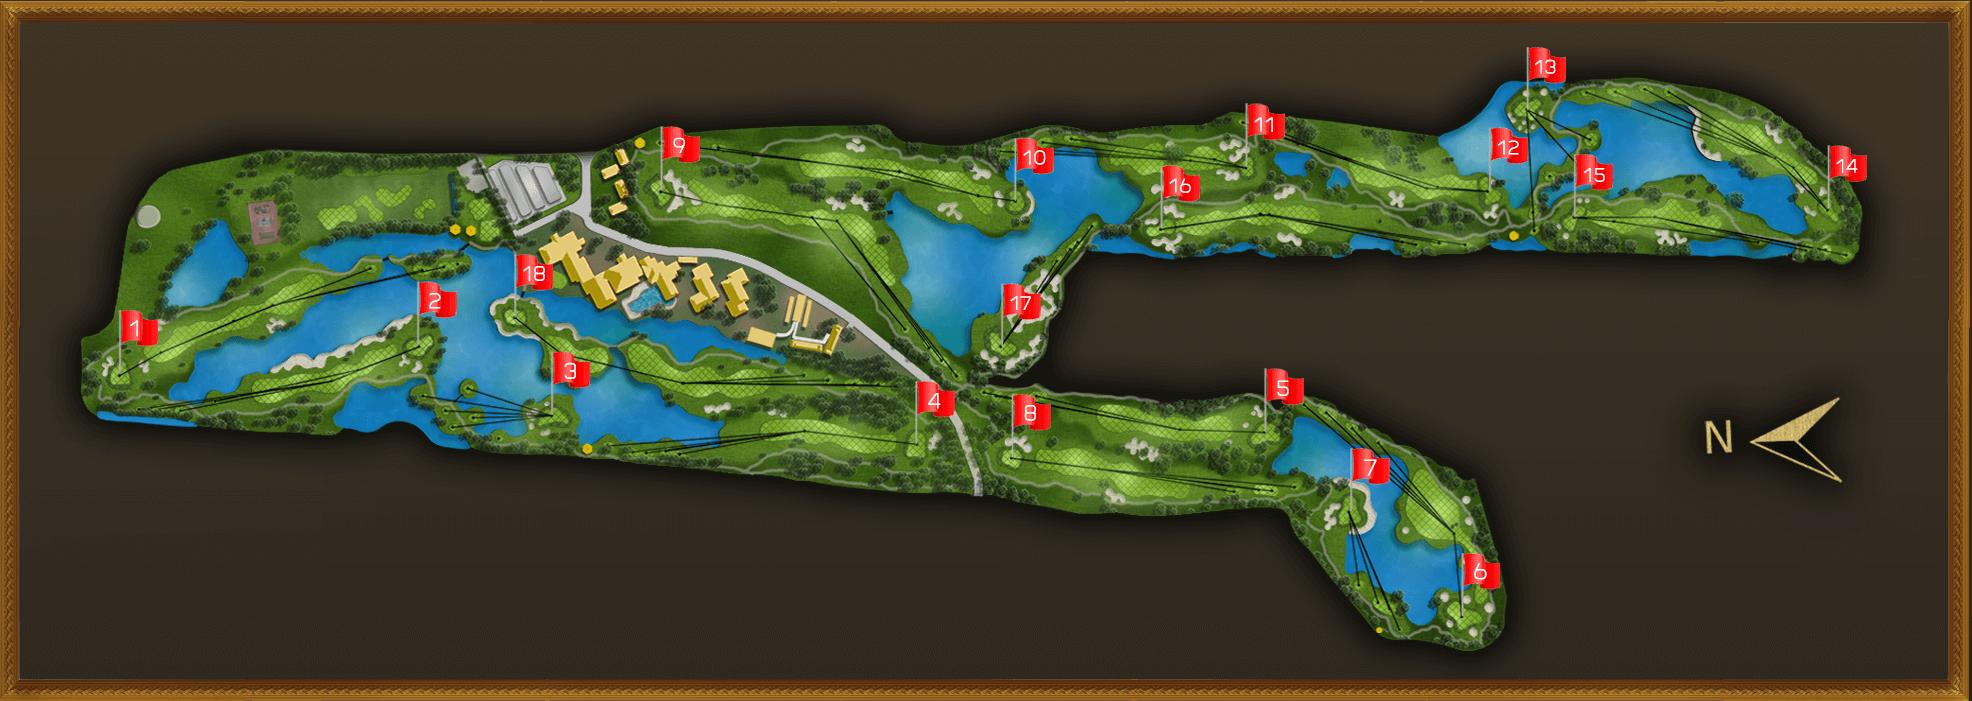 Golf Map